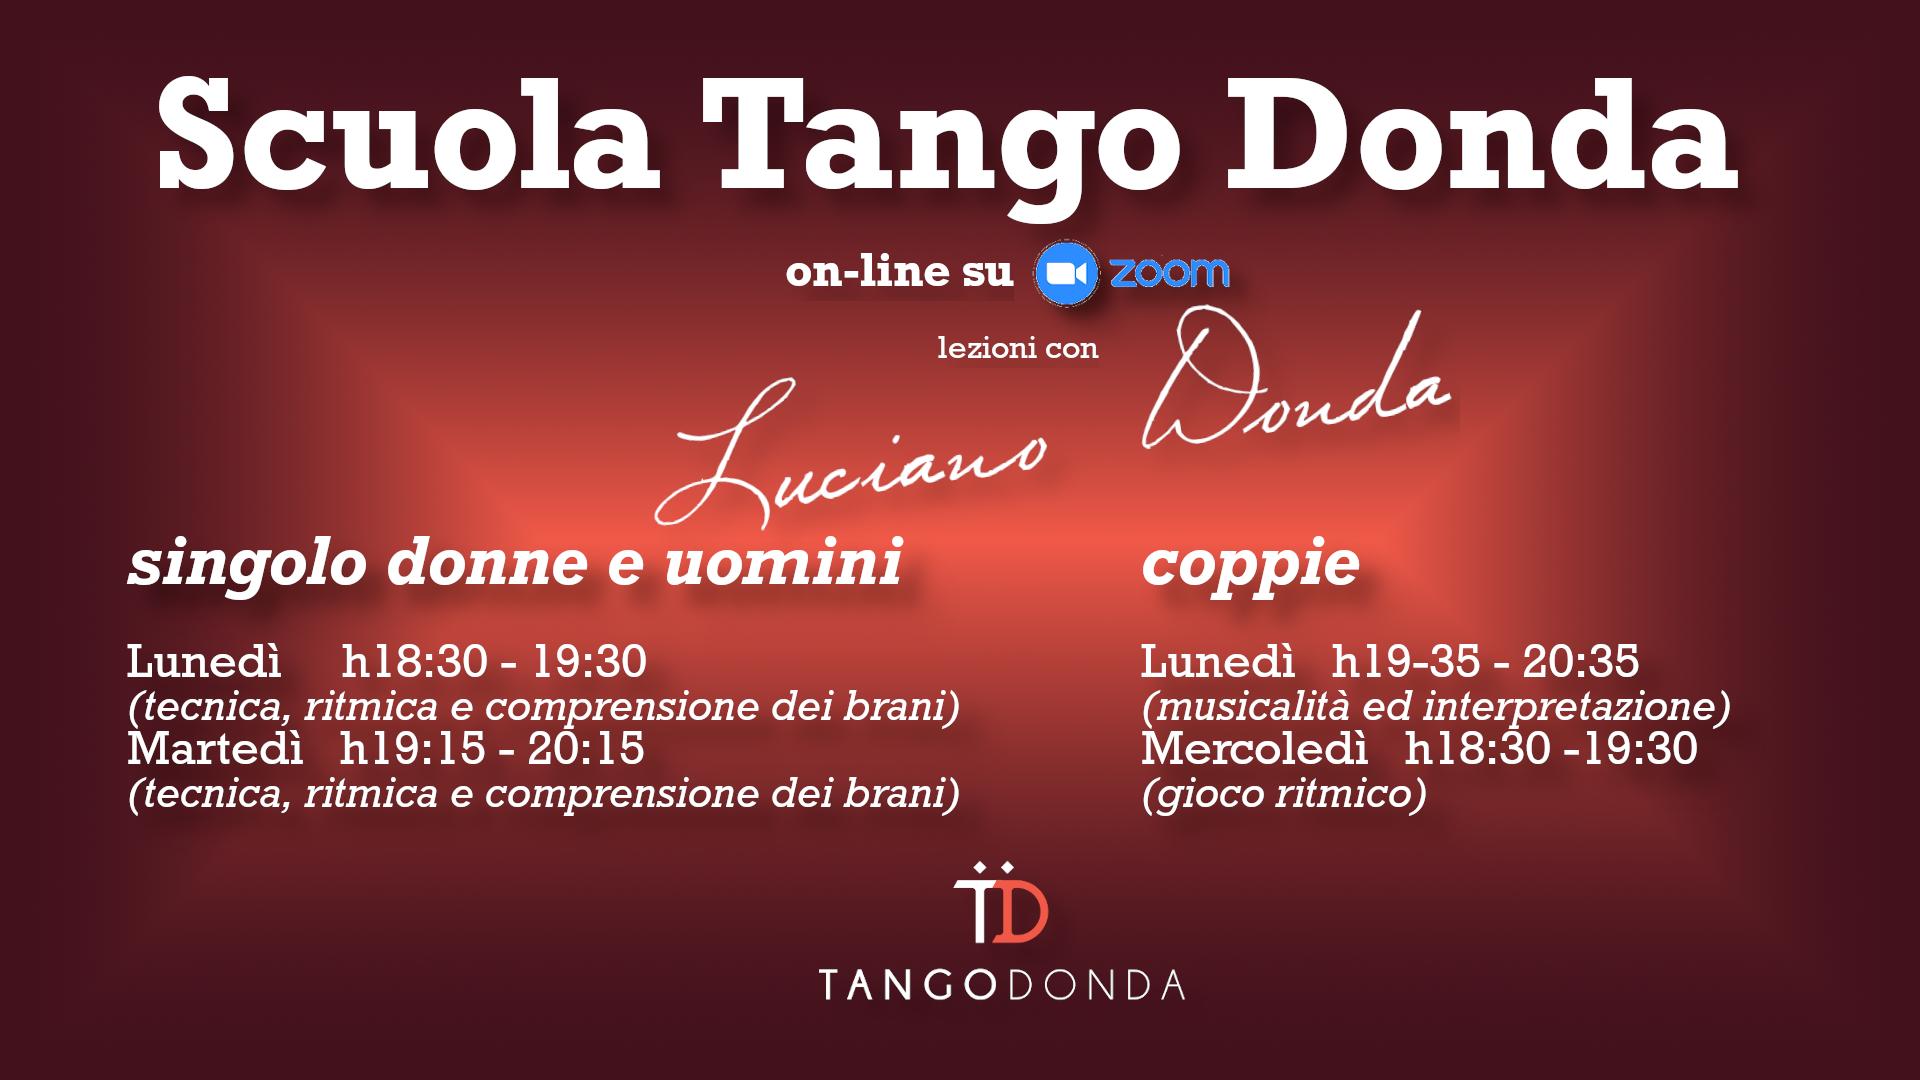 Scuola-online-tango-donda